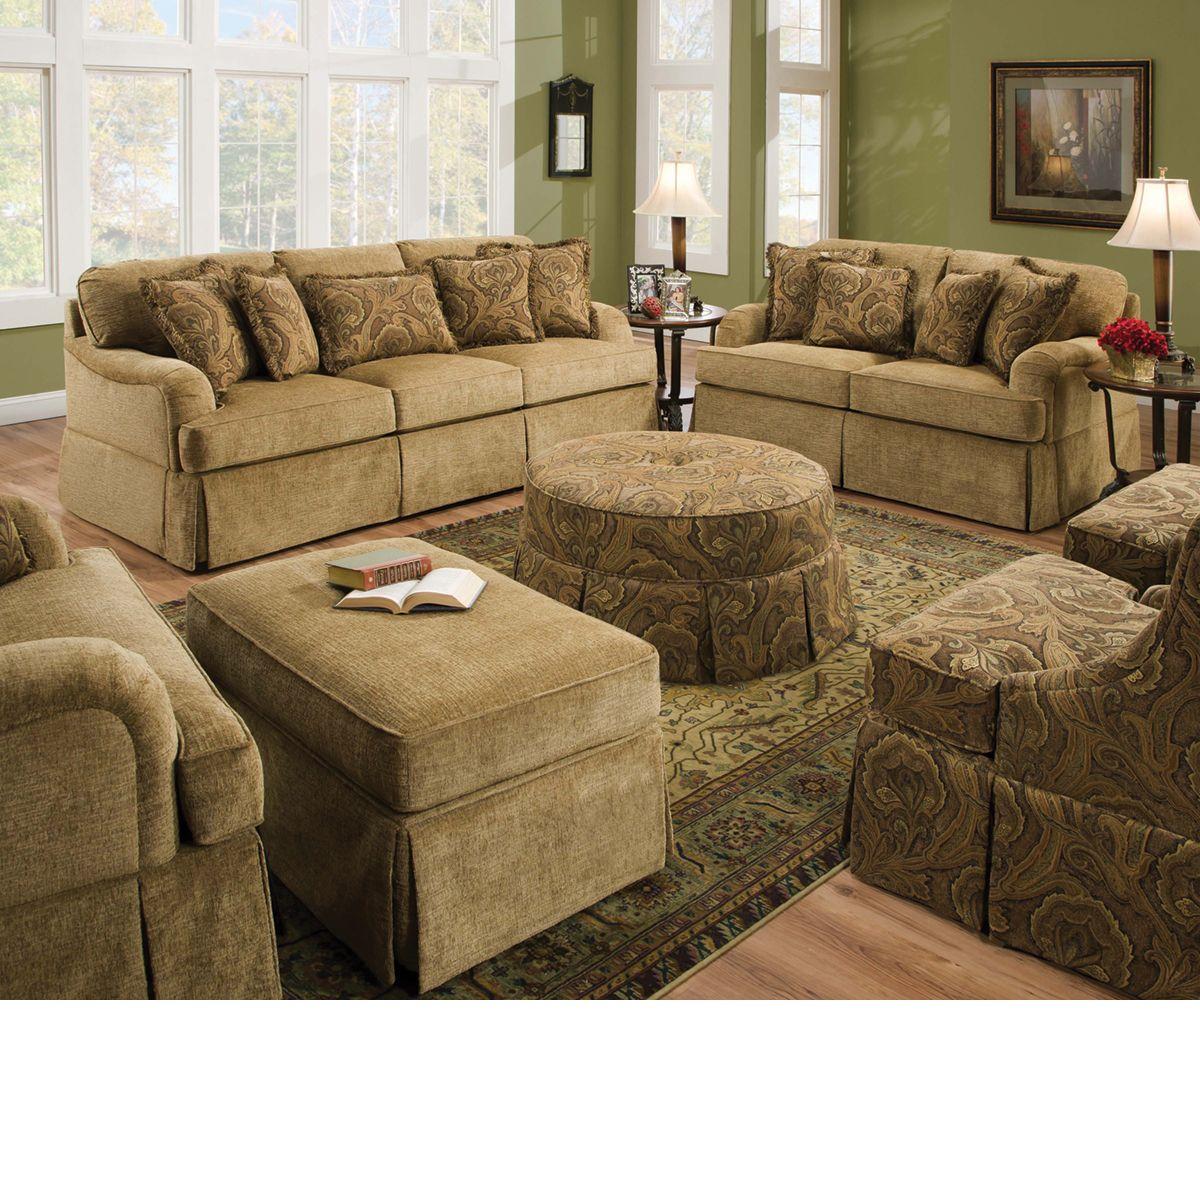 The Dump Furniture Westlake Sofa